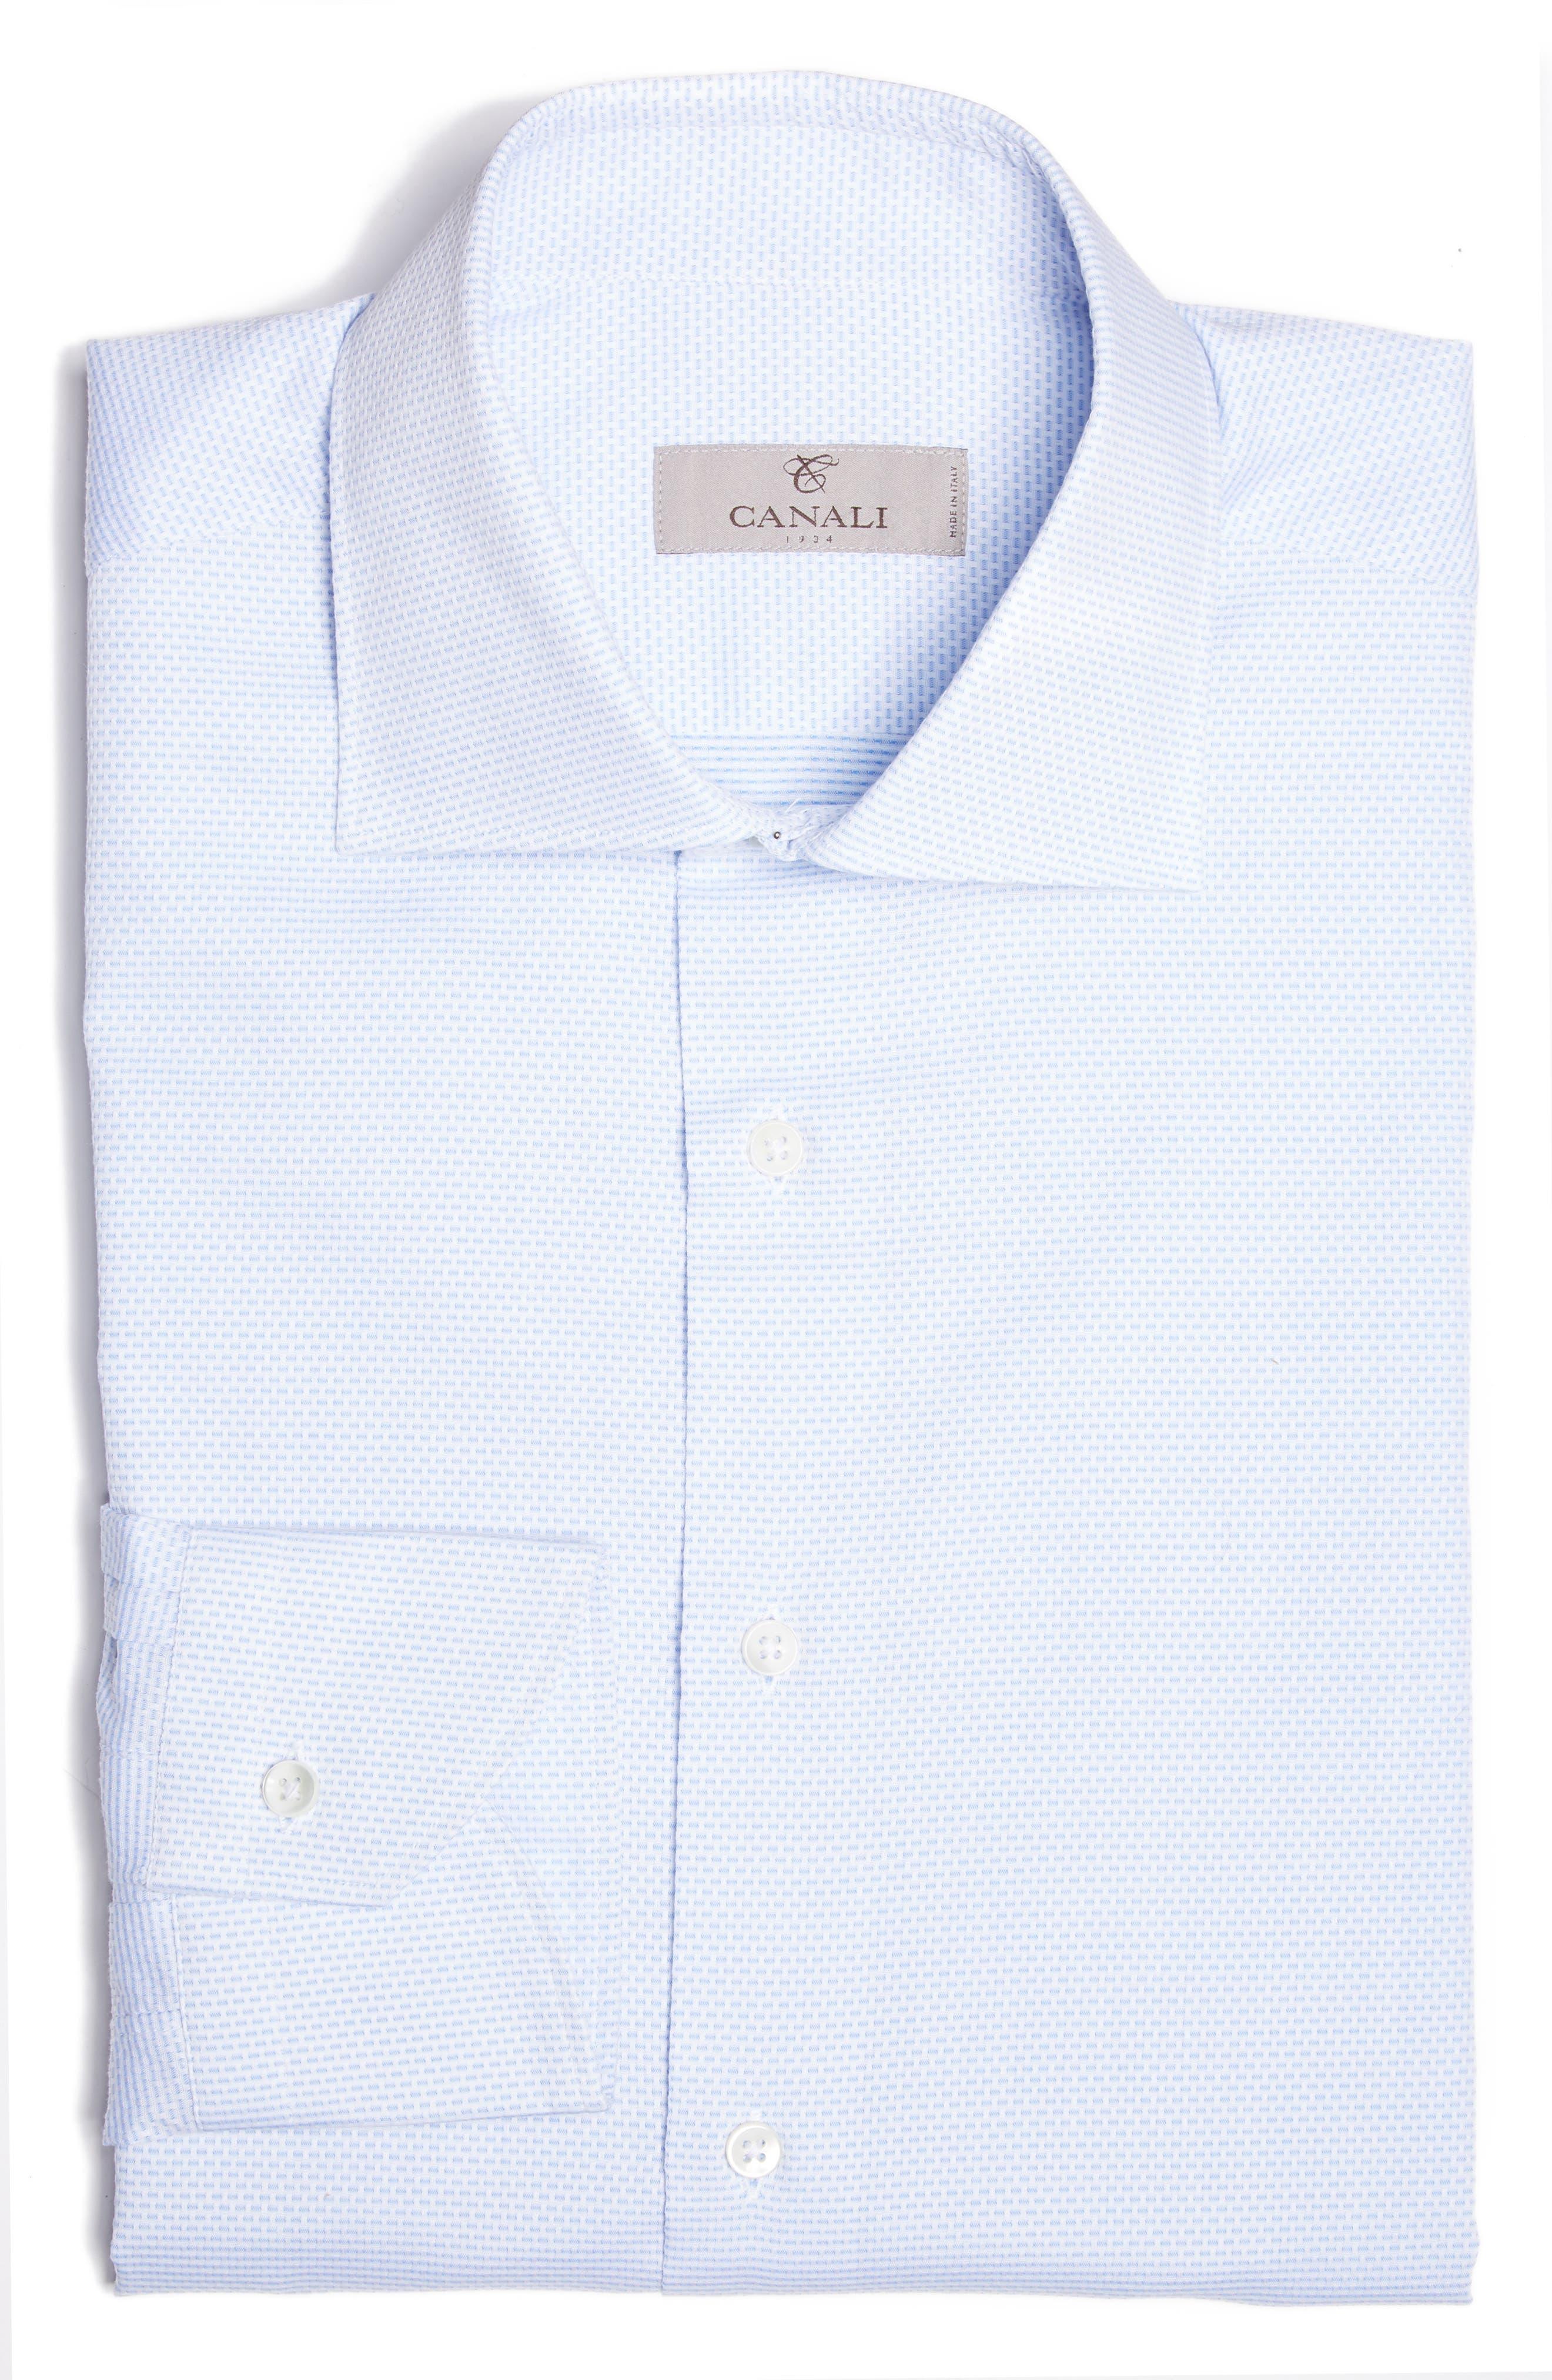 Regular Fit Solid Dress Shirt,                         Main,                         color, Light Blue